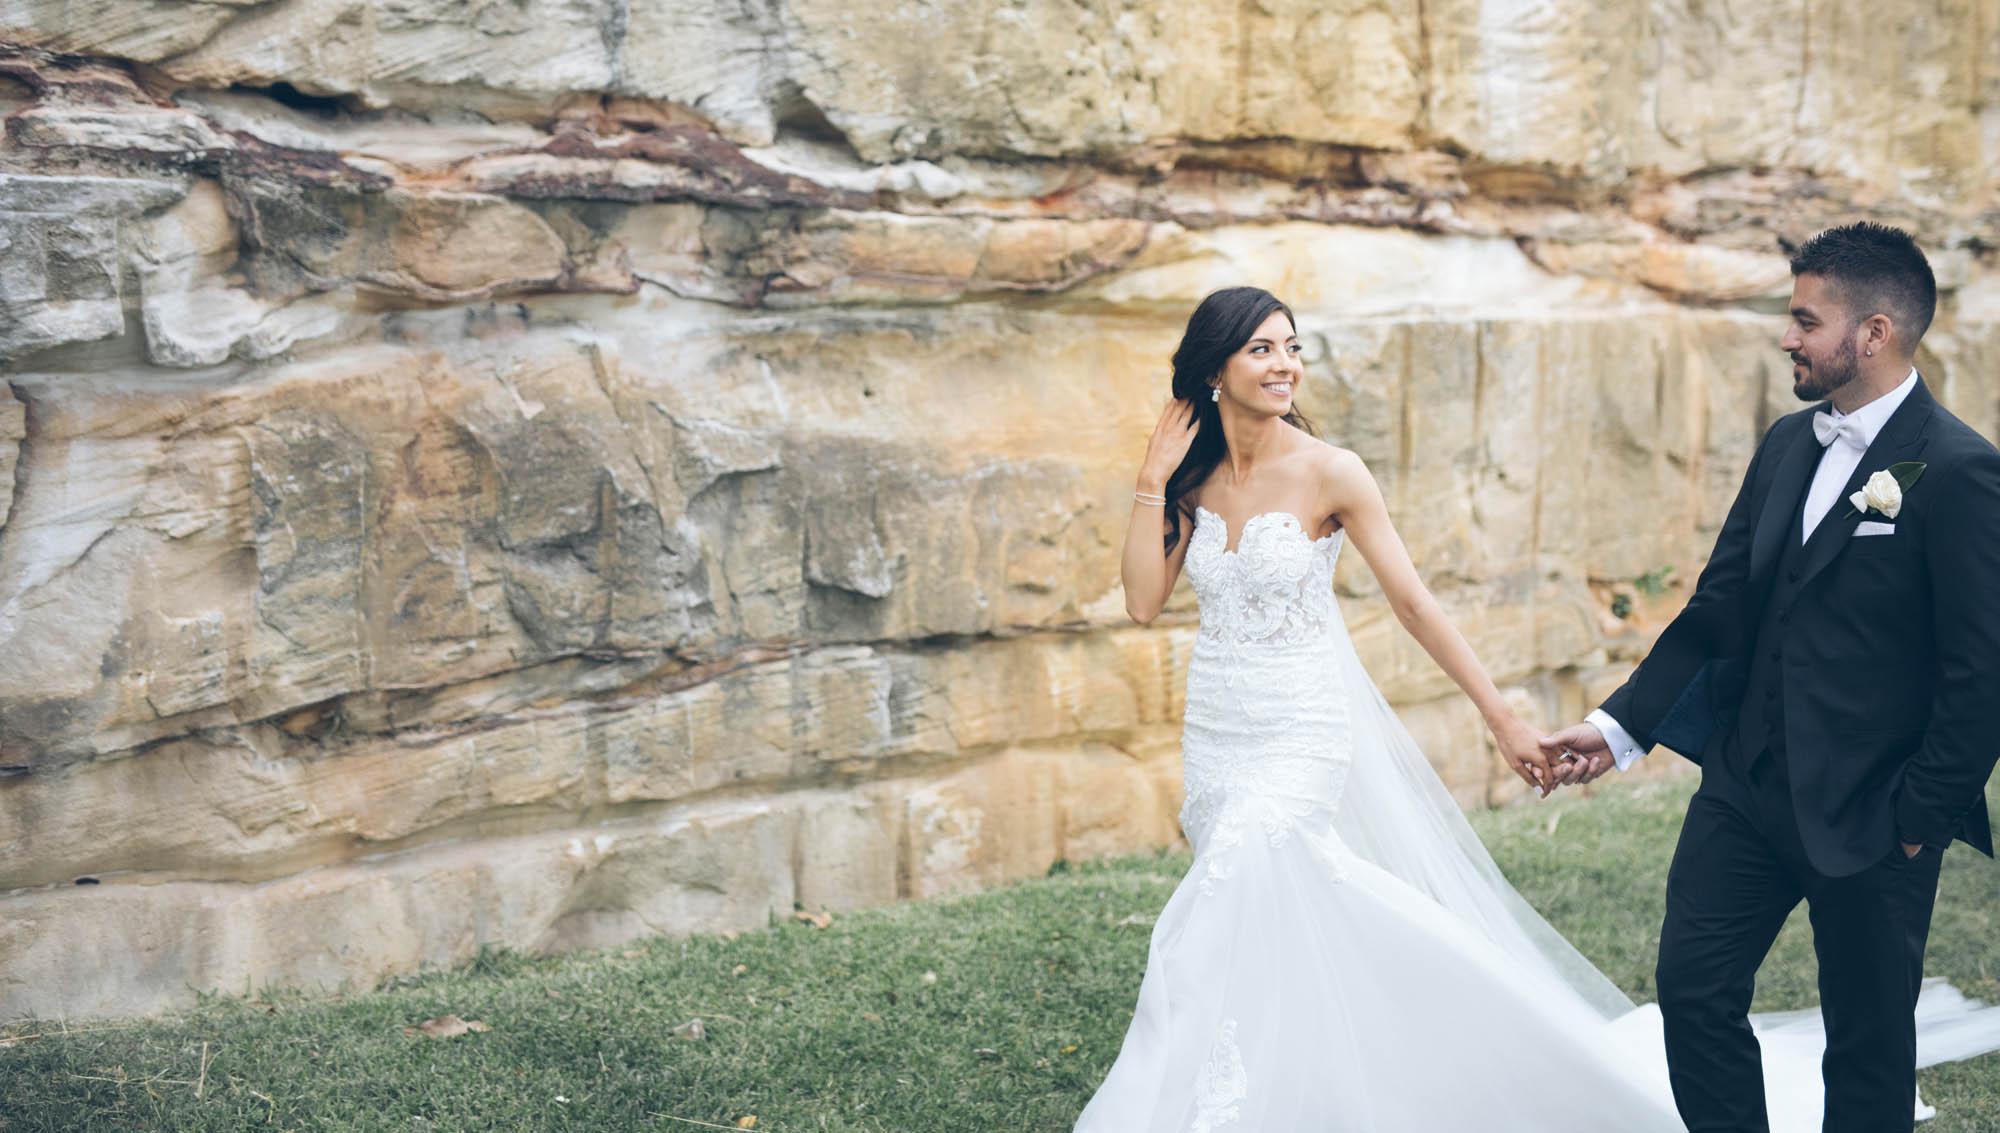 MacDougall-Photography-Sydney-Wedding-Photographers-57.jpg